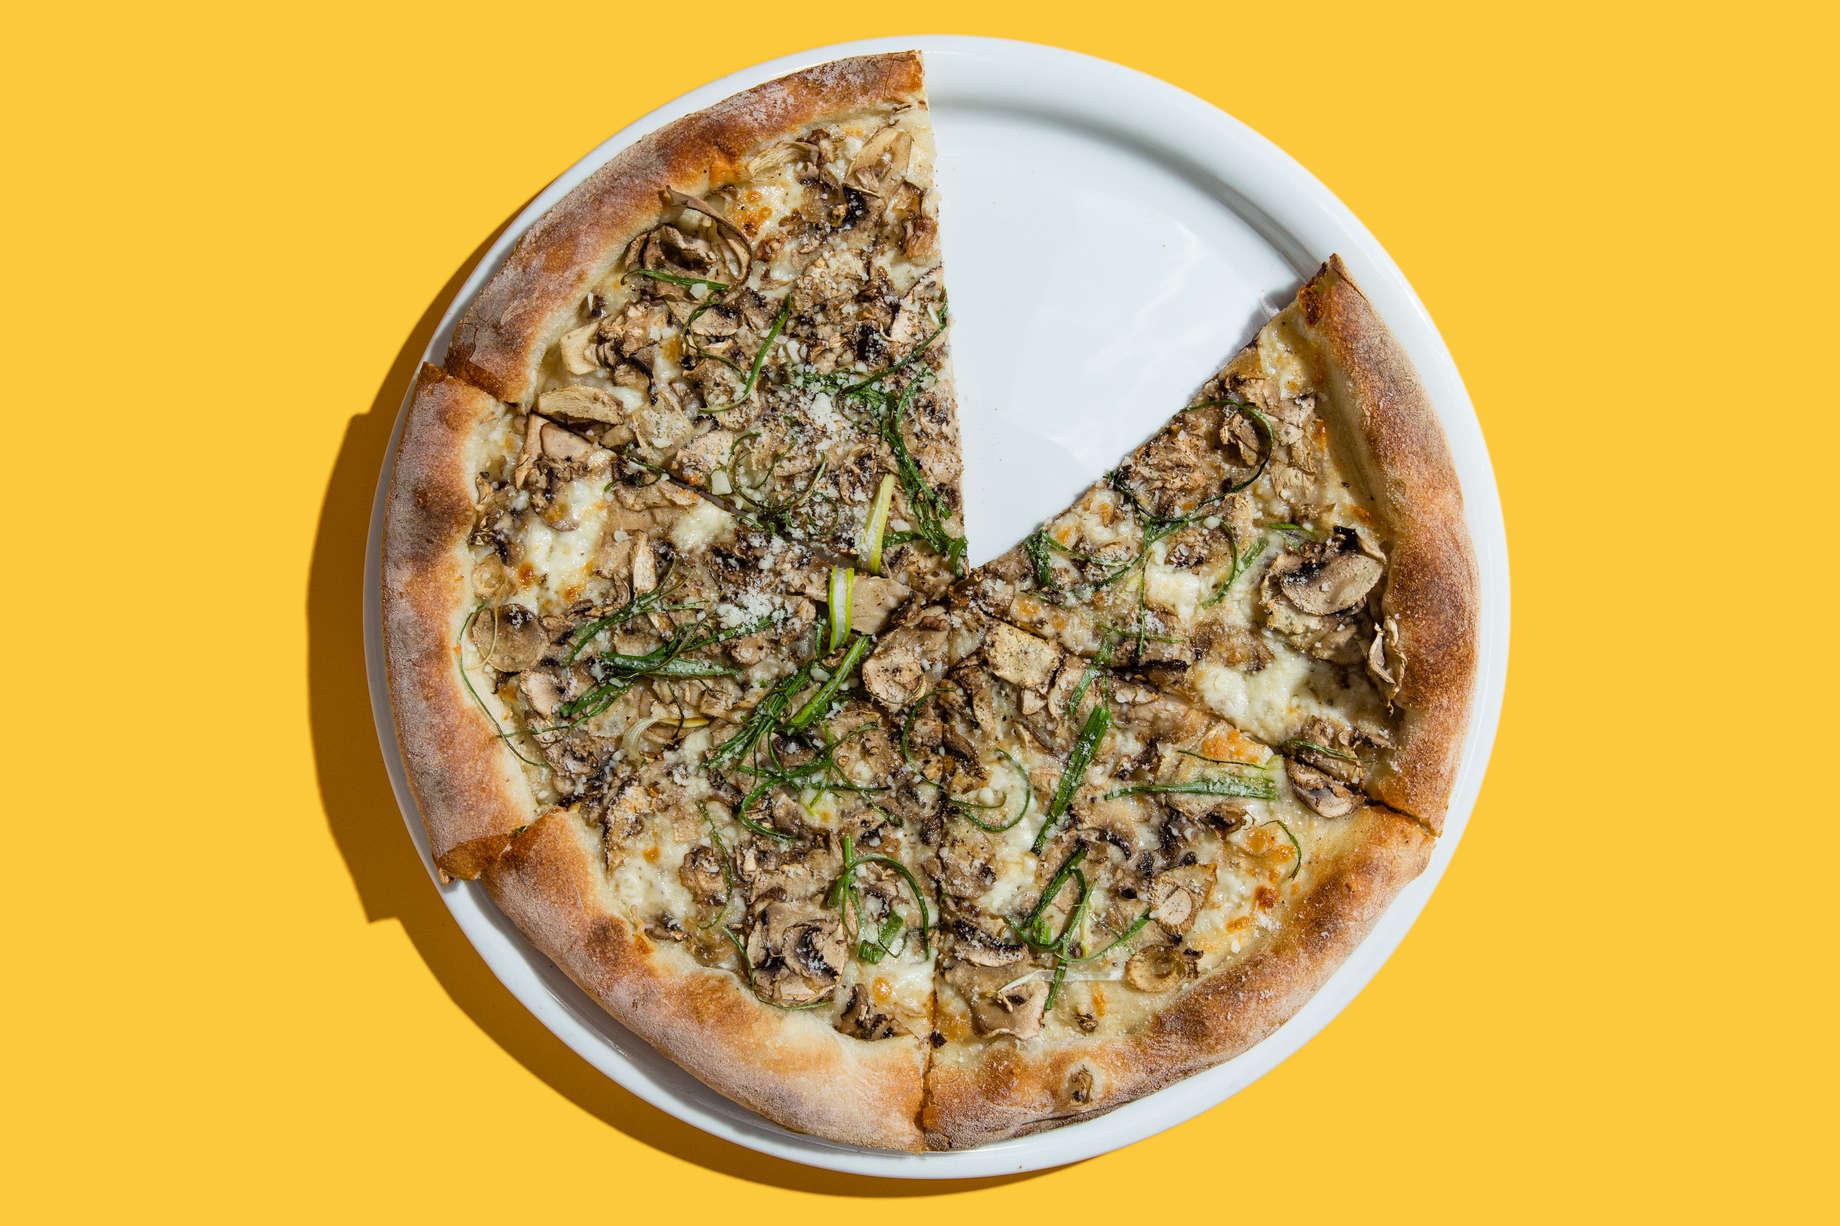 Remarkable Best California Pizza Kitchen Pizzas Every Cpk Pizza Pie Interior Design Ideas Clesiryabchikinfo